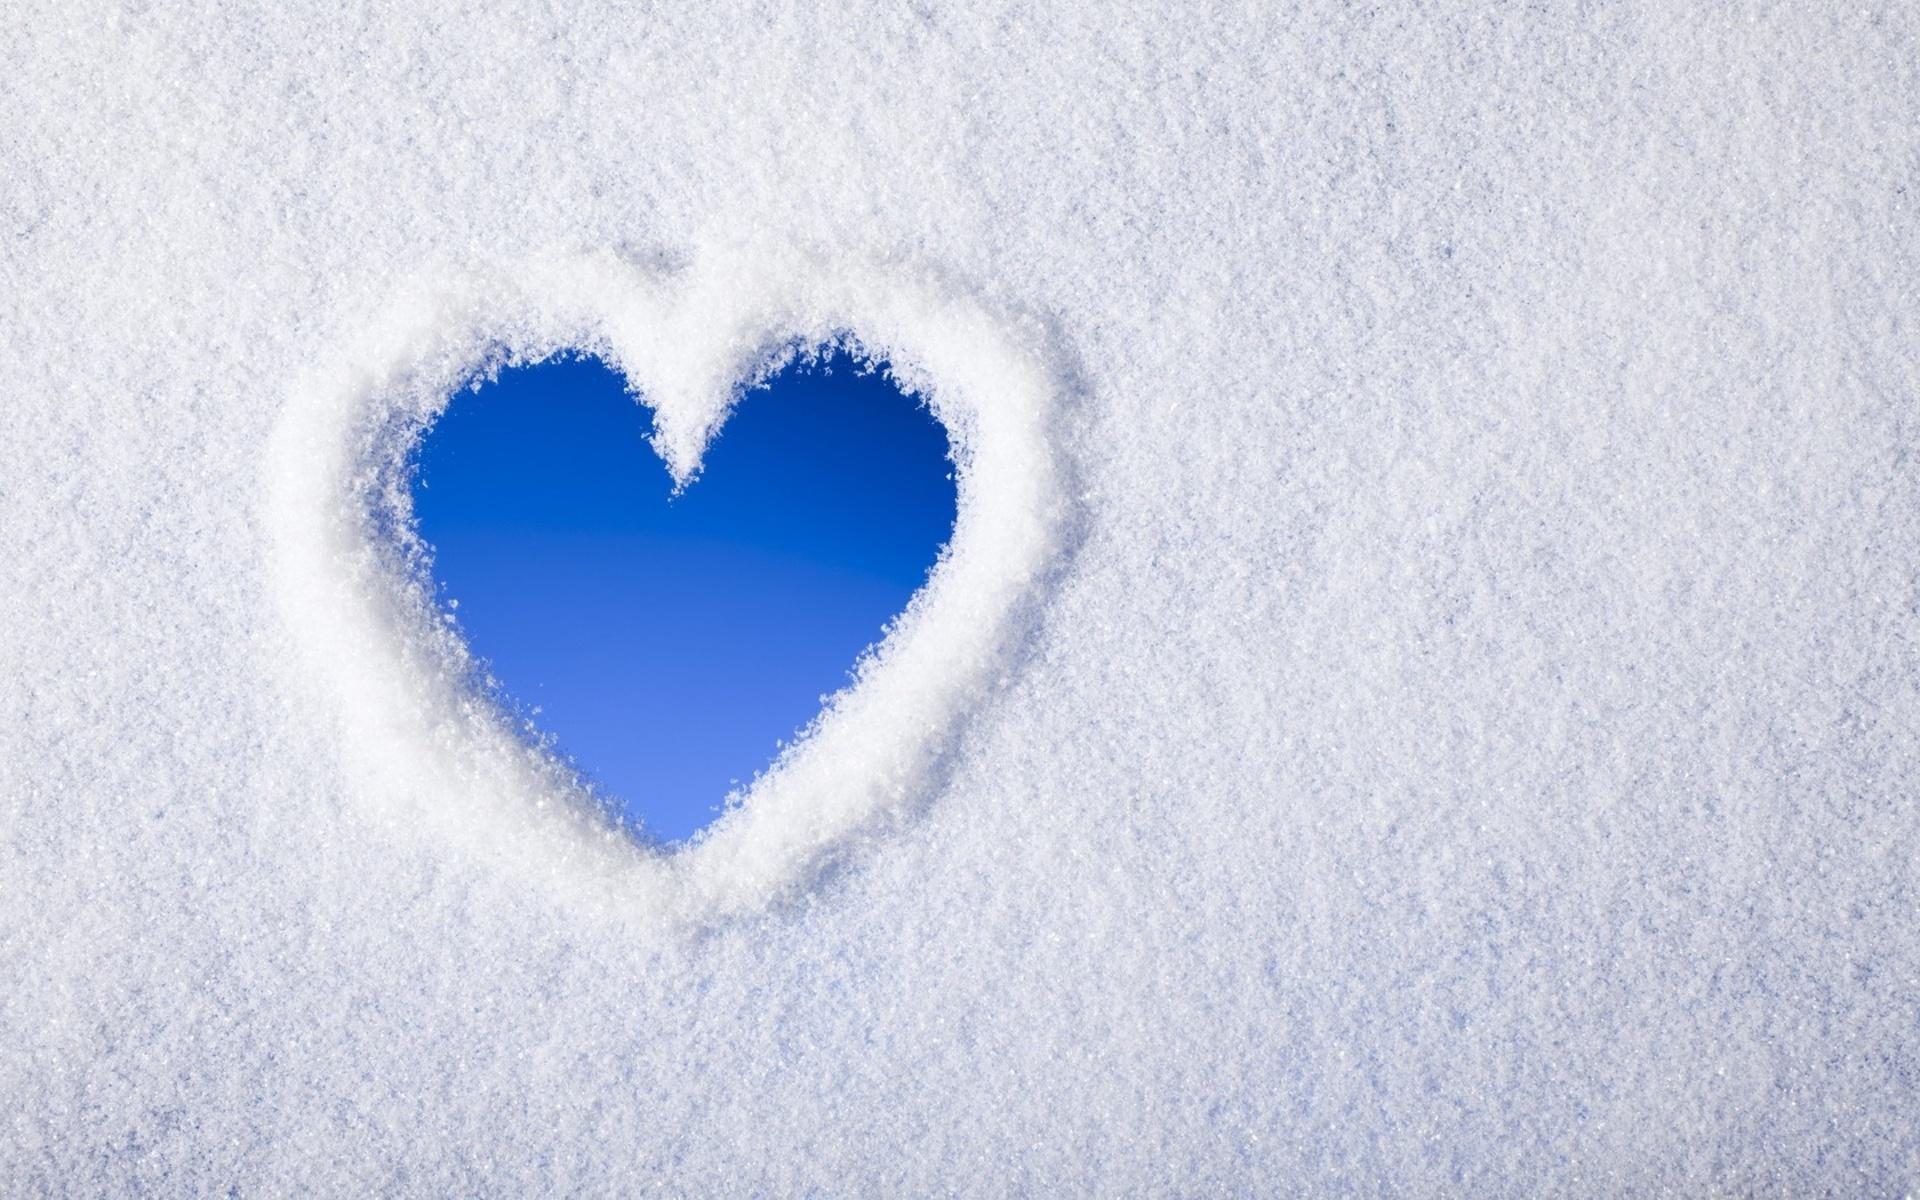 snow wallpaper heart